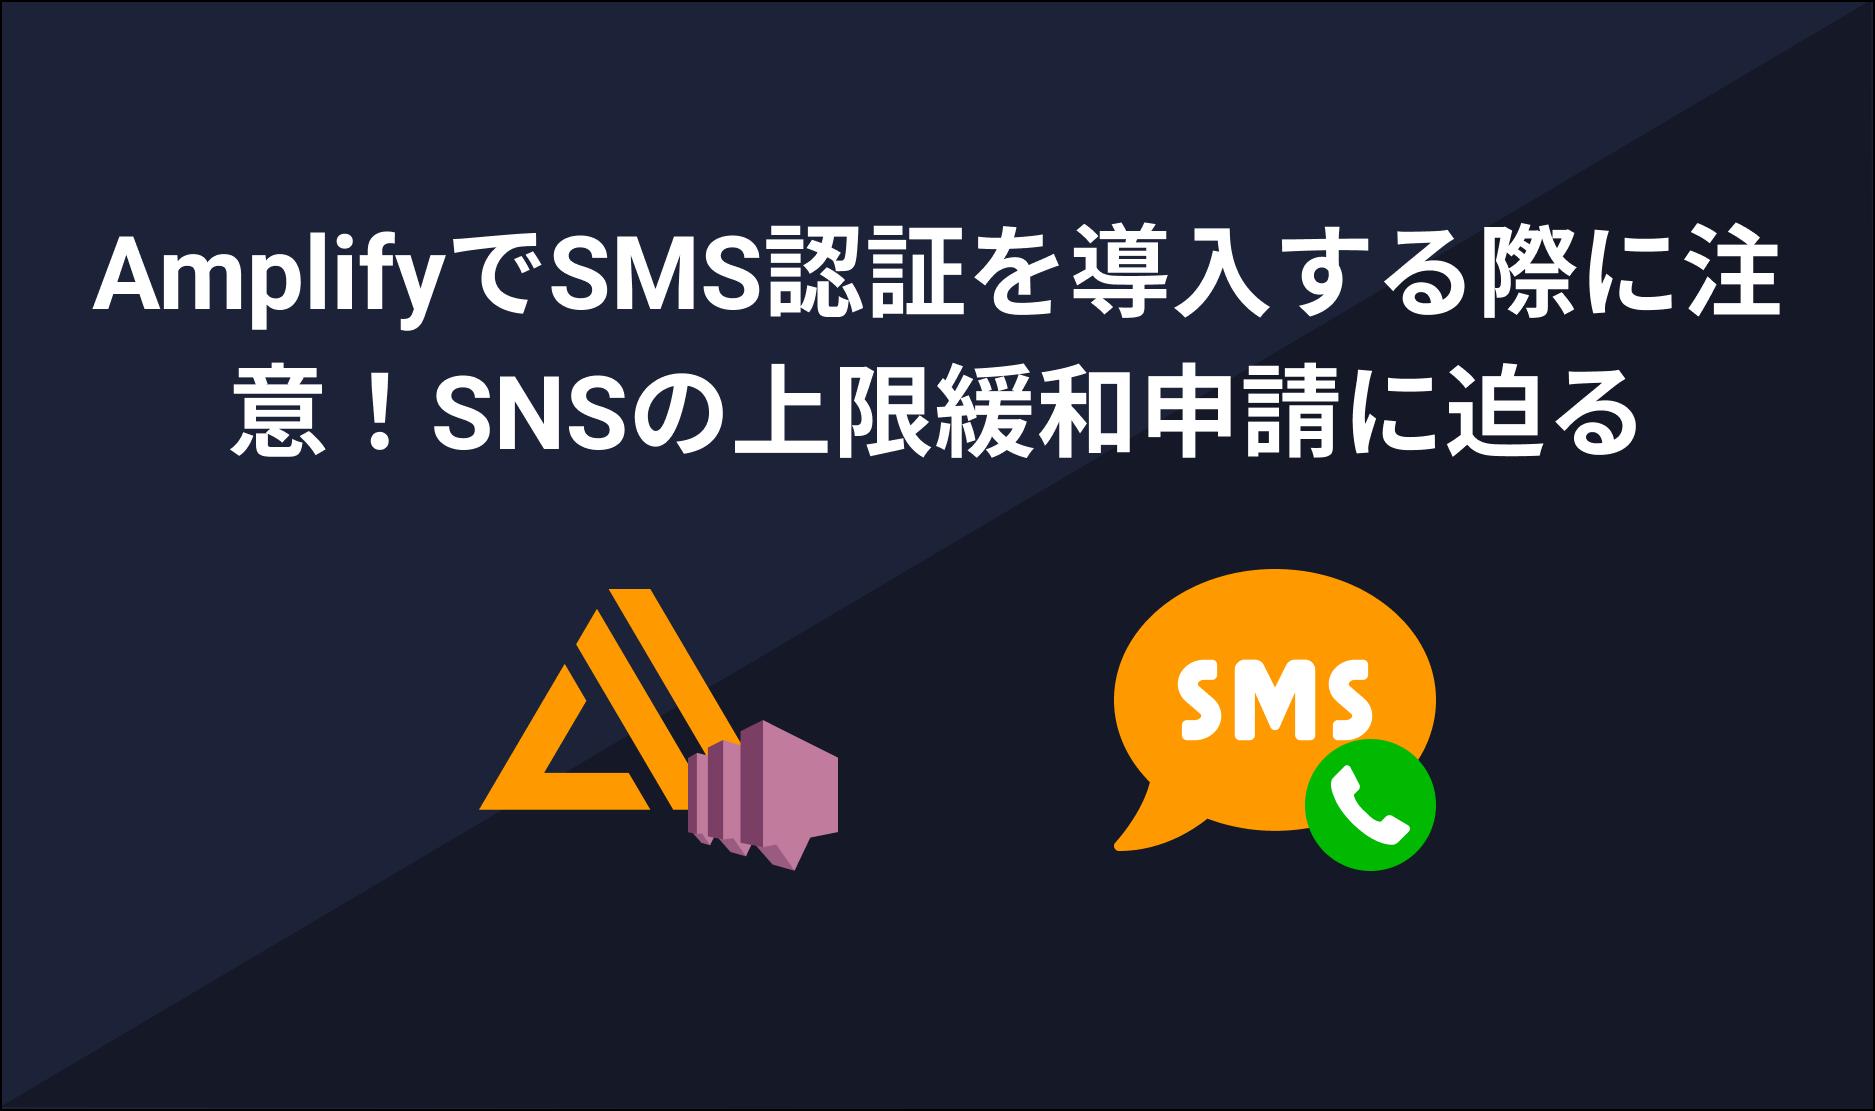 AmplifyでSMS認証を導入する際に注意すること!SNSの上限緩和申請に迫る